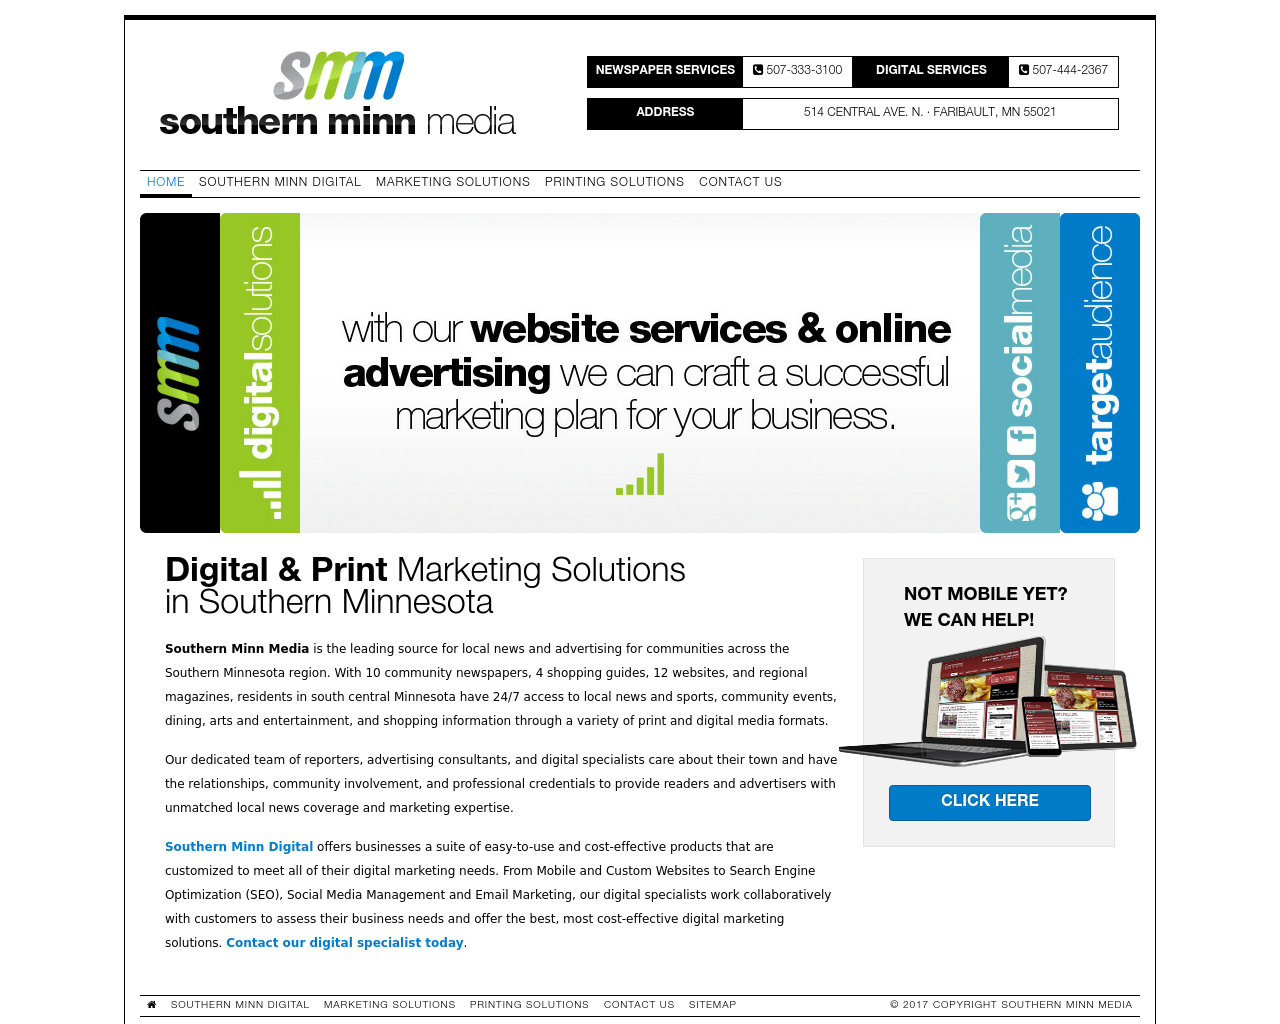 Southern-Minn-Media-Advertising-Reviews-Pricing